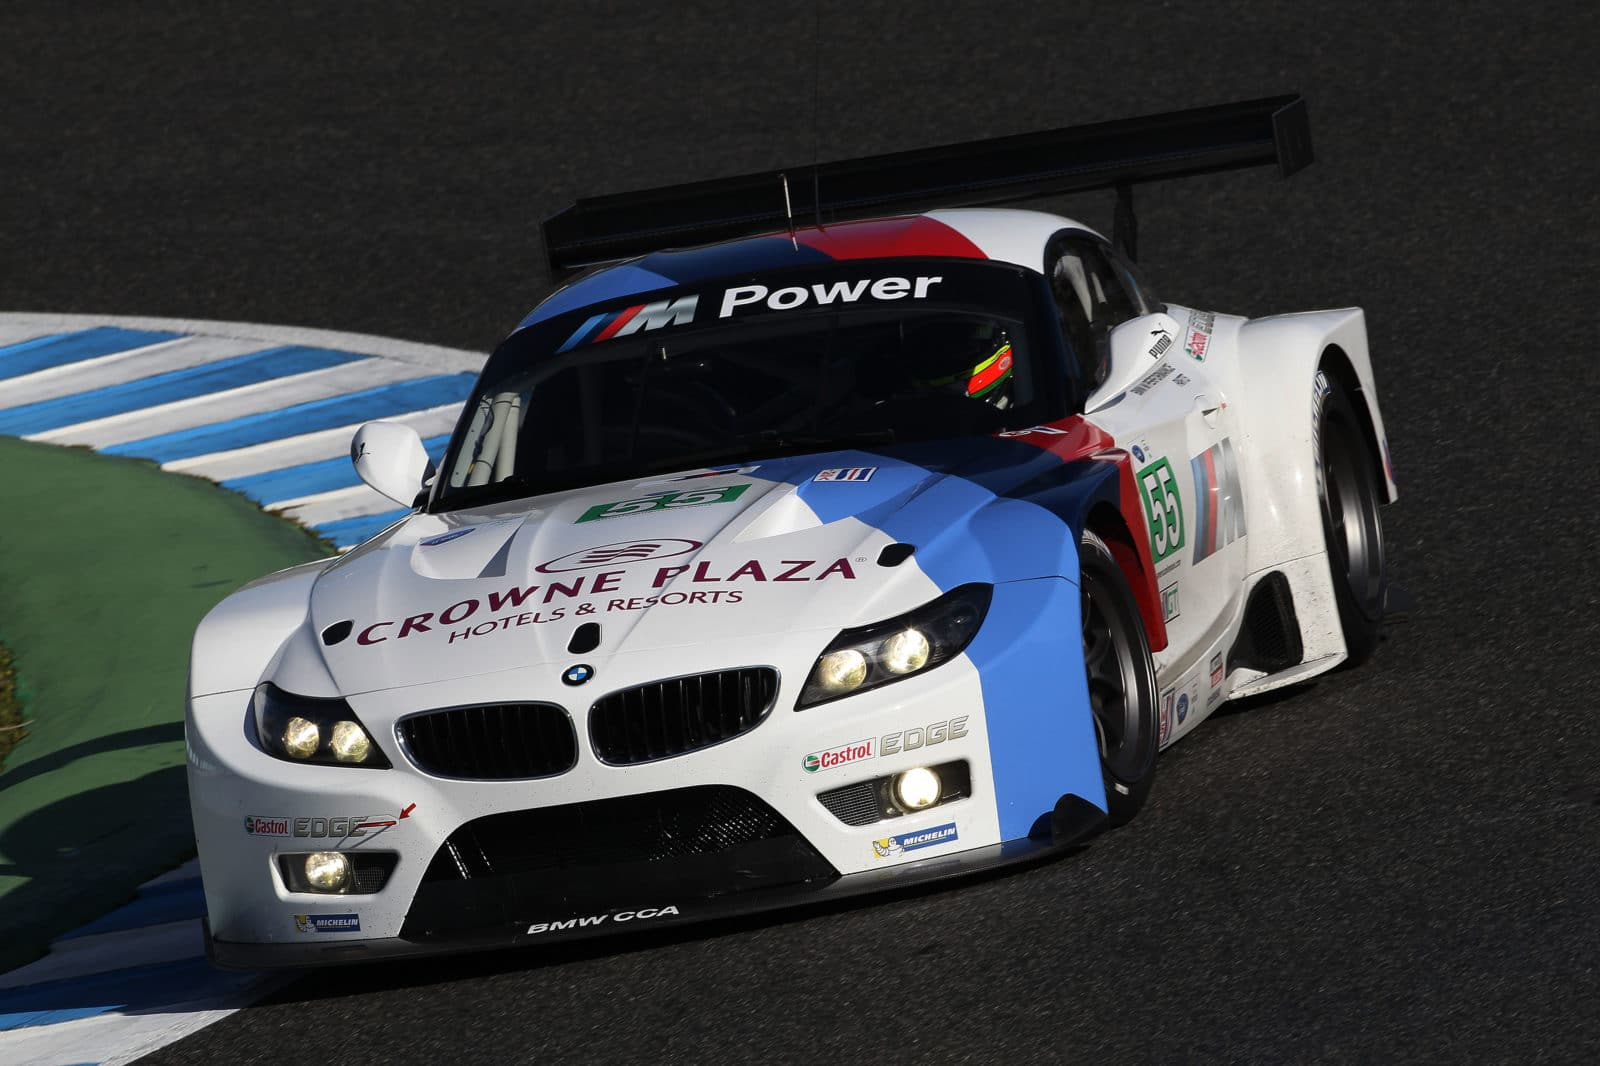 Bmw Viser Z4 Gte Racemag